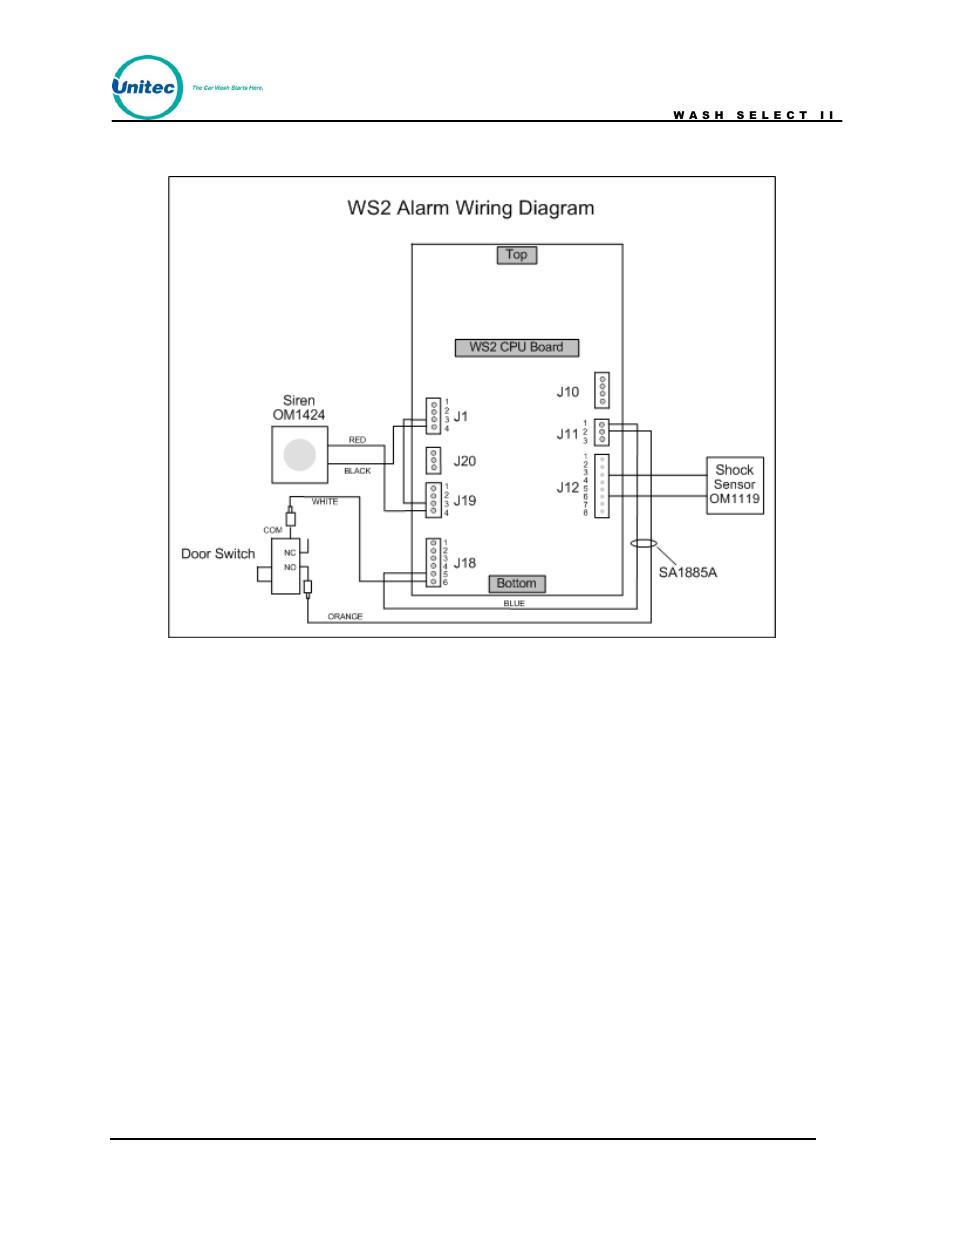 Figure 38  Ws2 Alarm Wiring Diagram